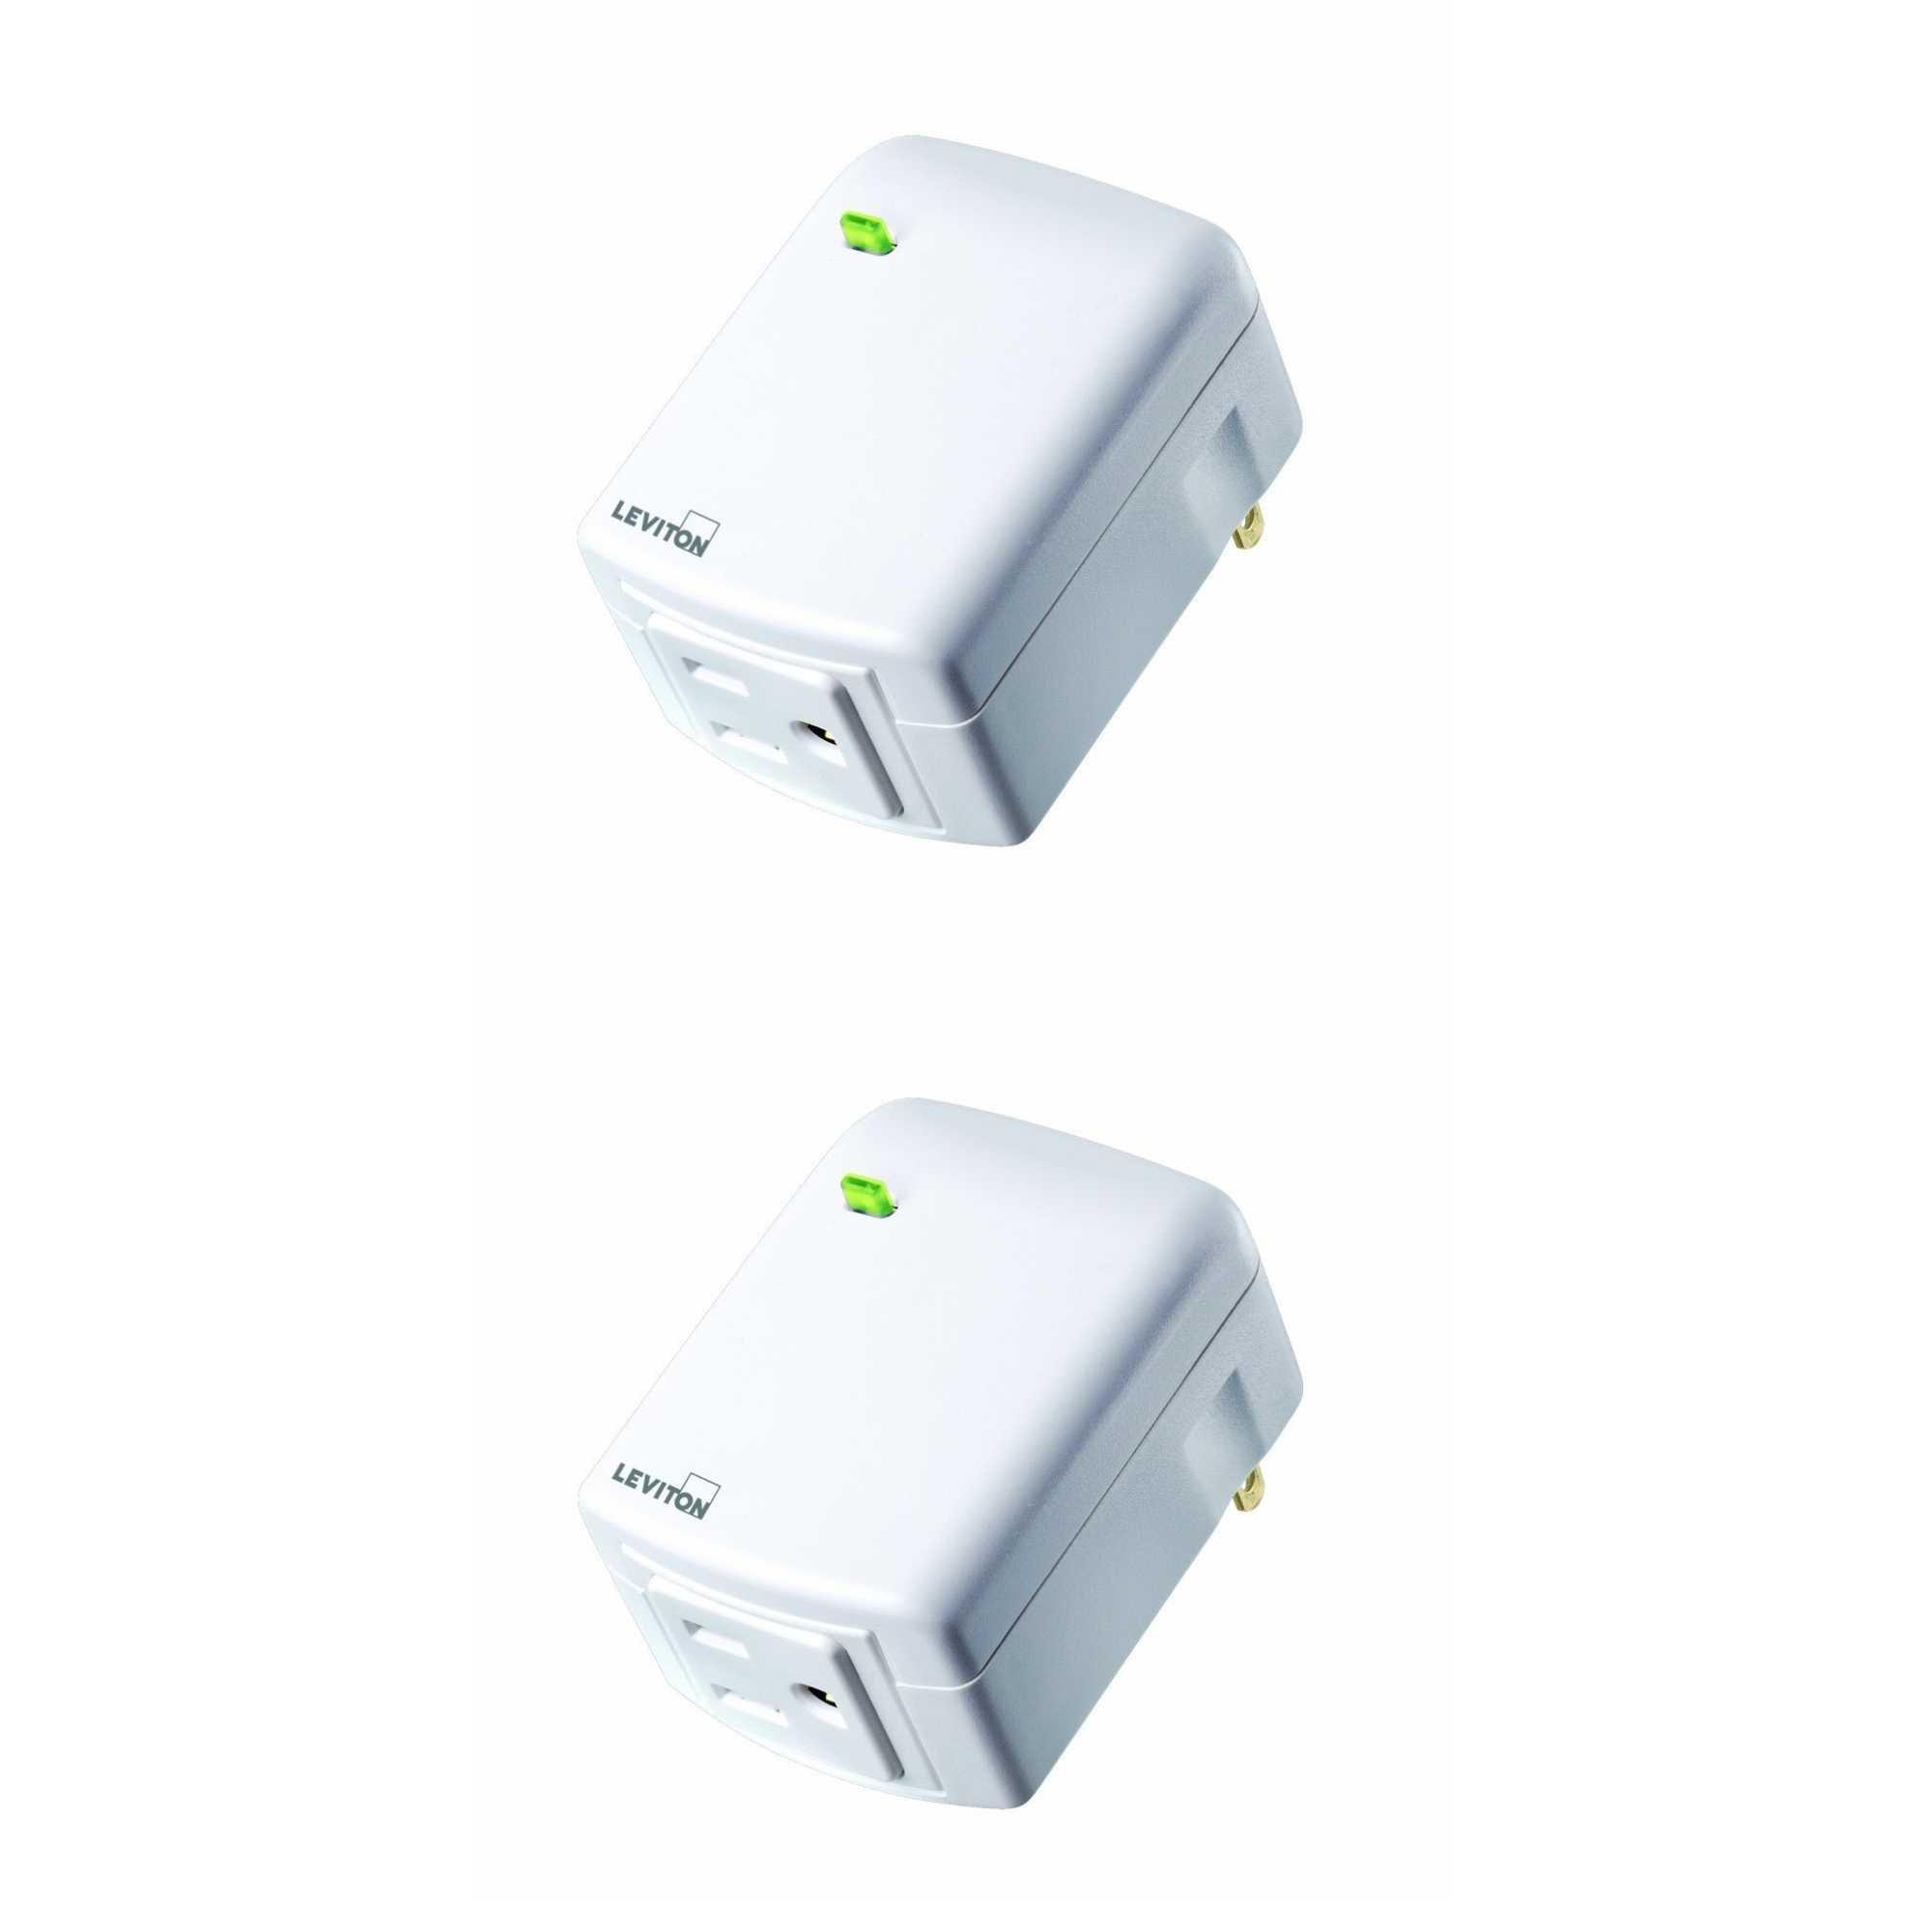 Leviton DW15A-1BW Decora Wi-Fi Plug-in Outlet, Works w/Amazon Alexa (2 Pack) by Leviton